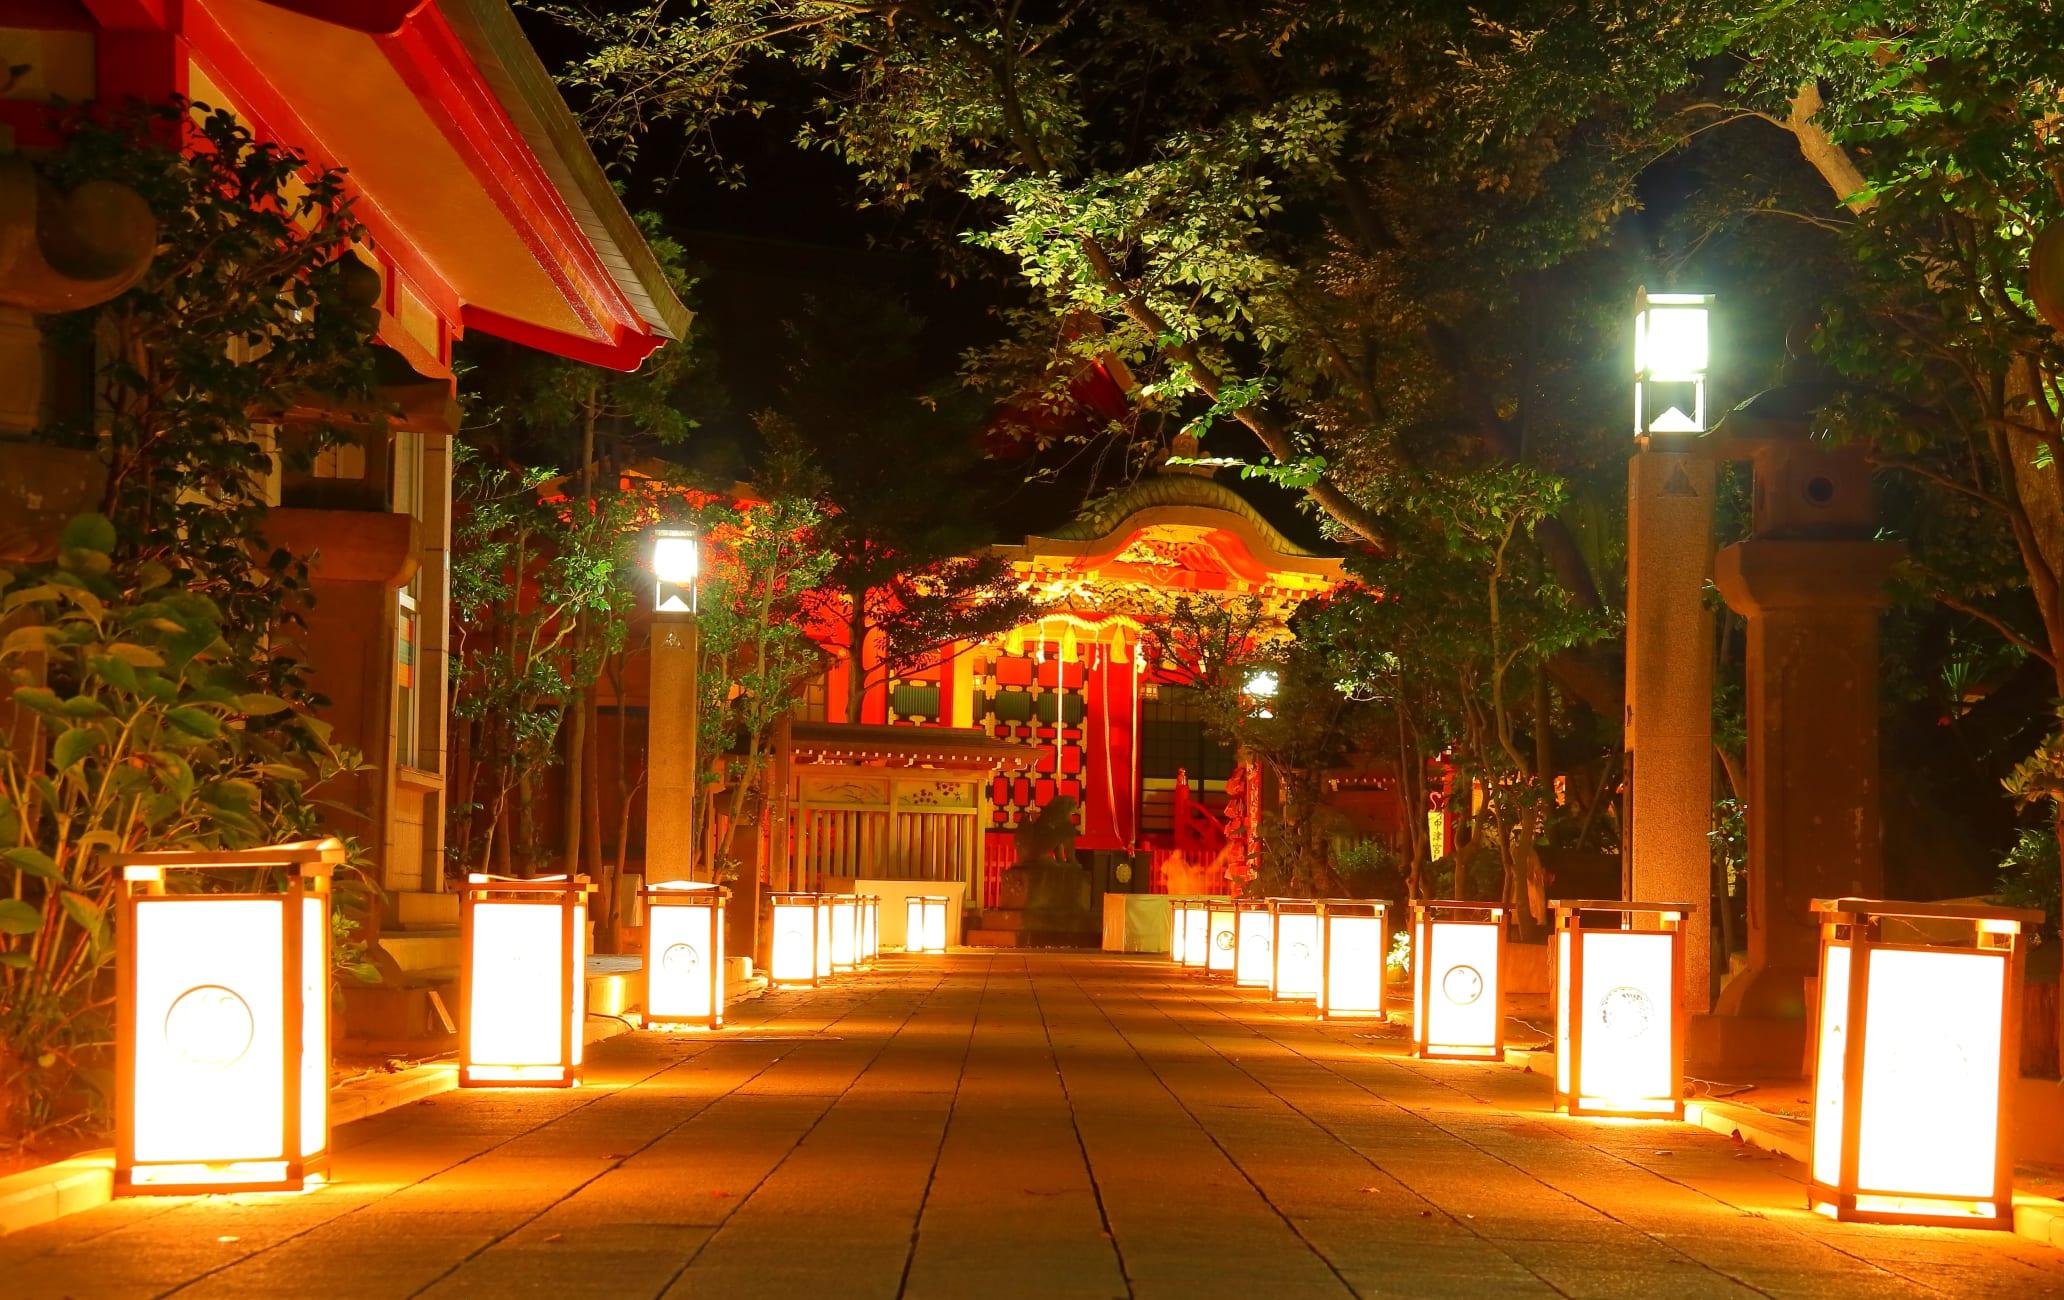 Enoshima-jinja Shrine